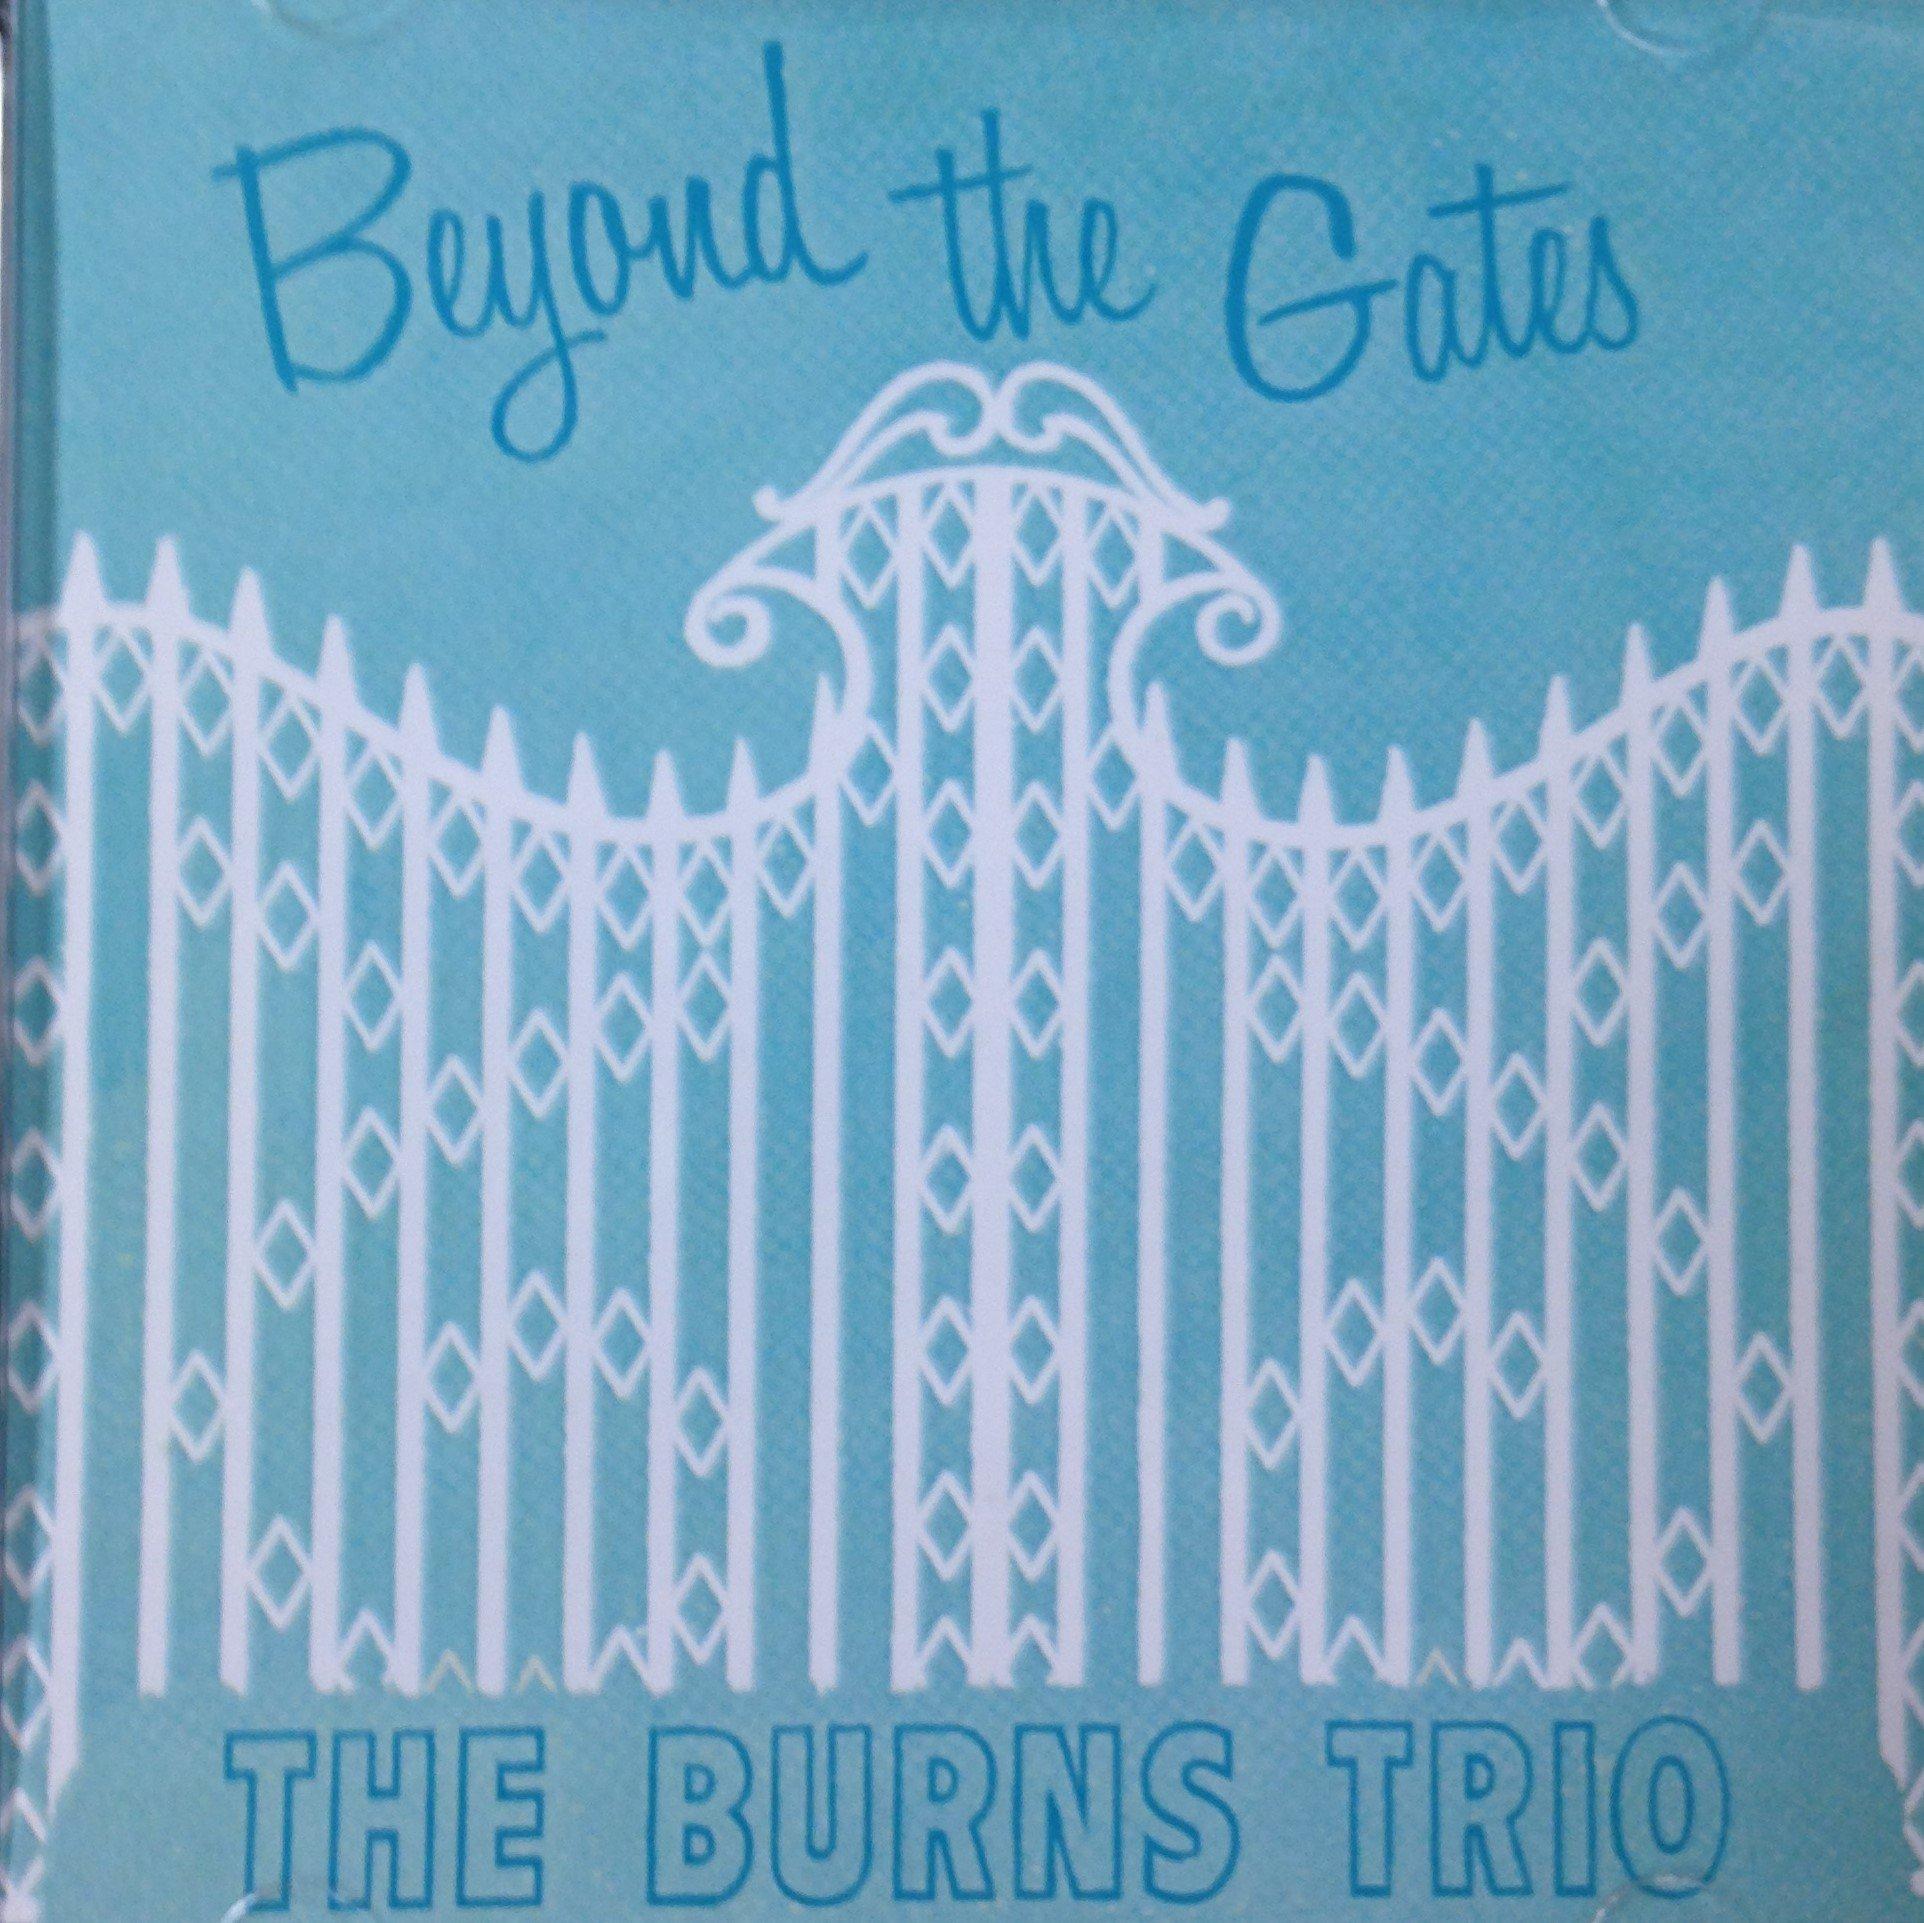 The Burns Trio:  Beyond the Gates  CD 00039